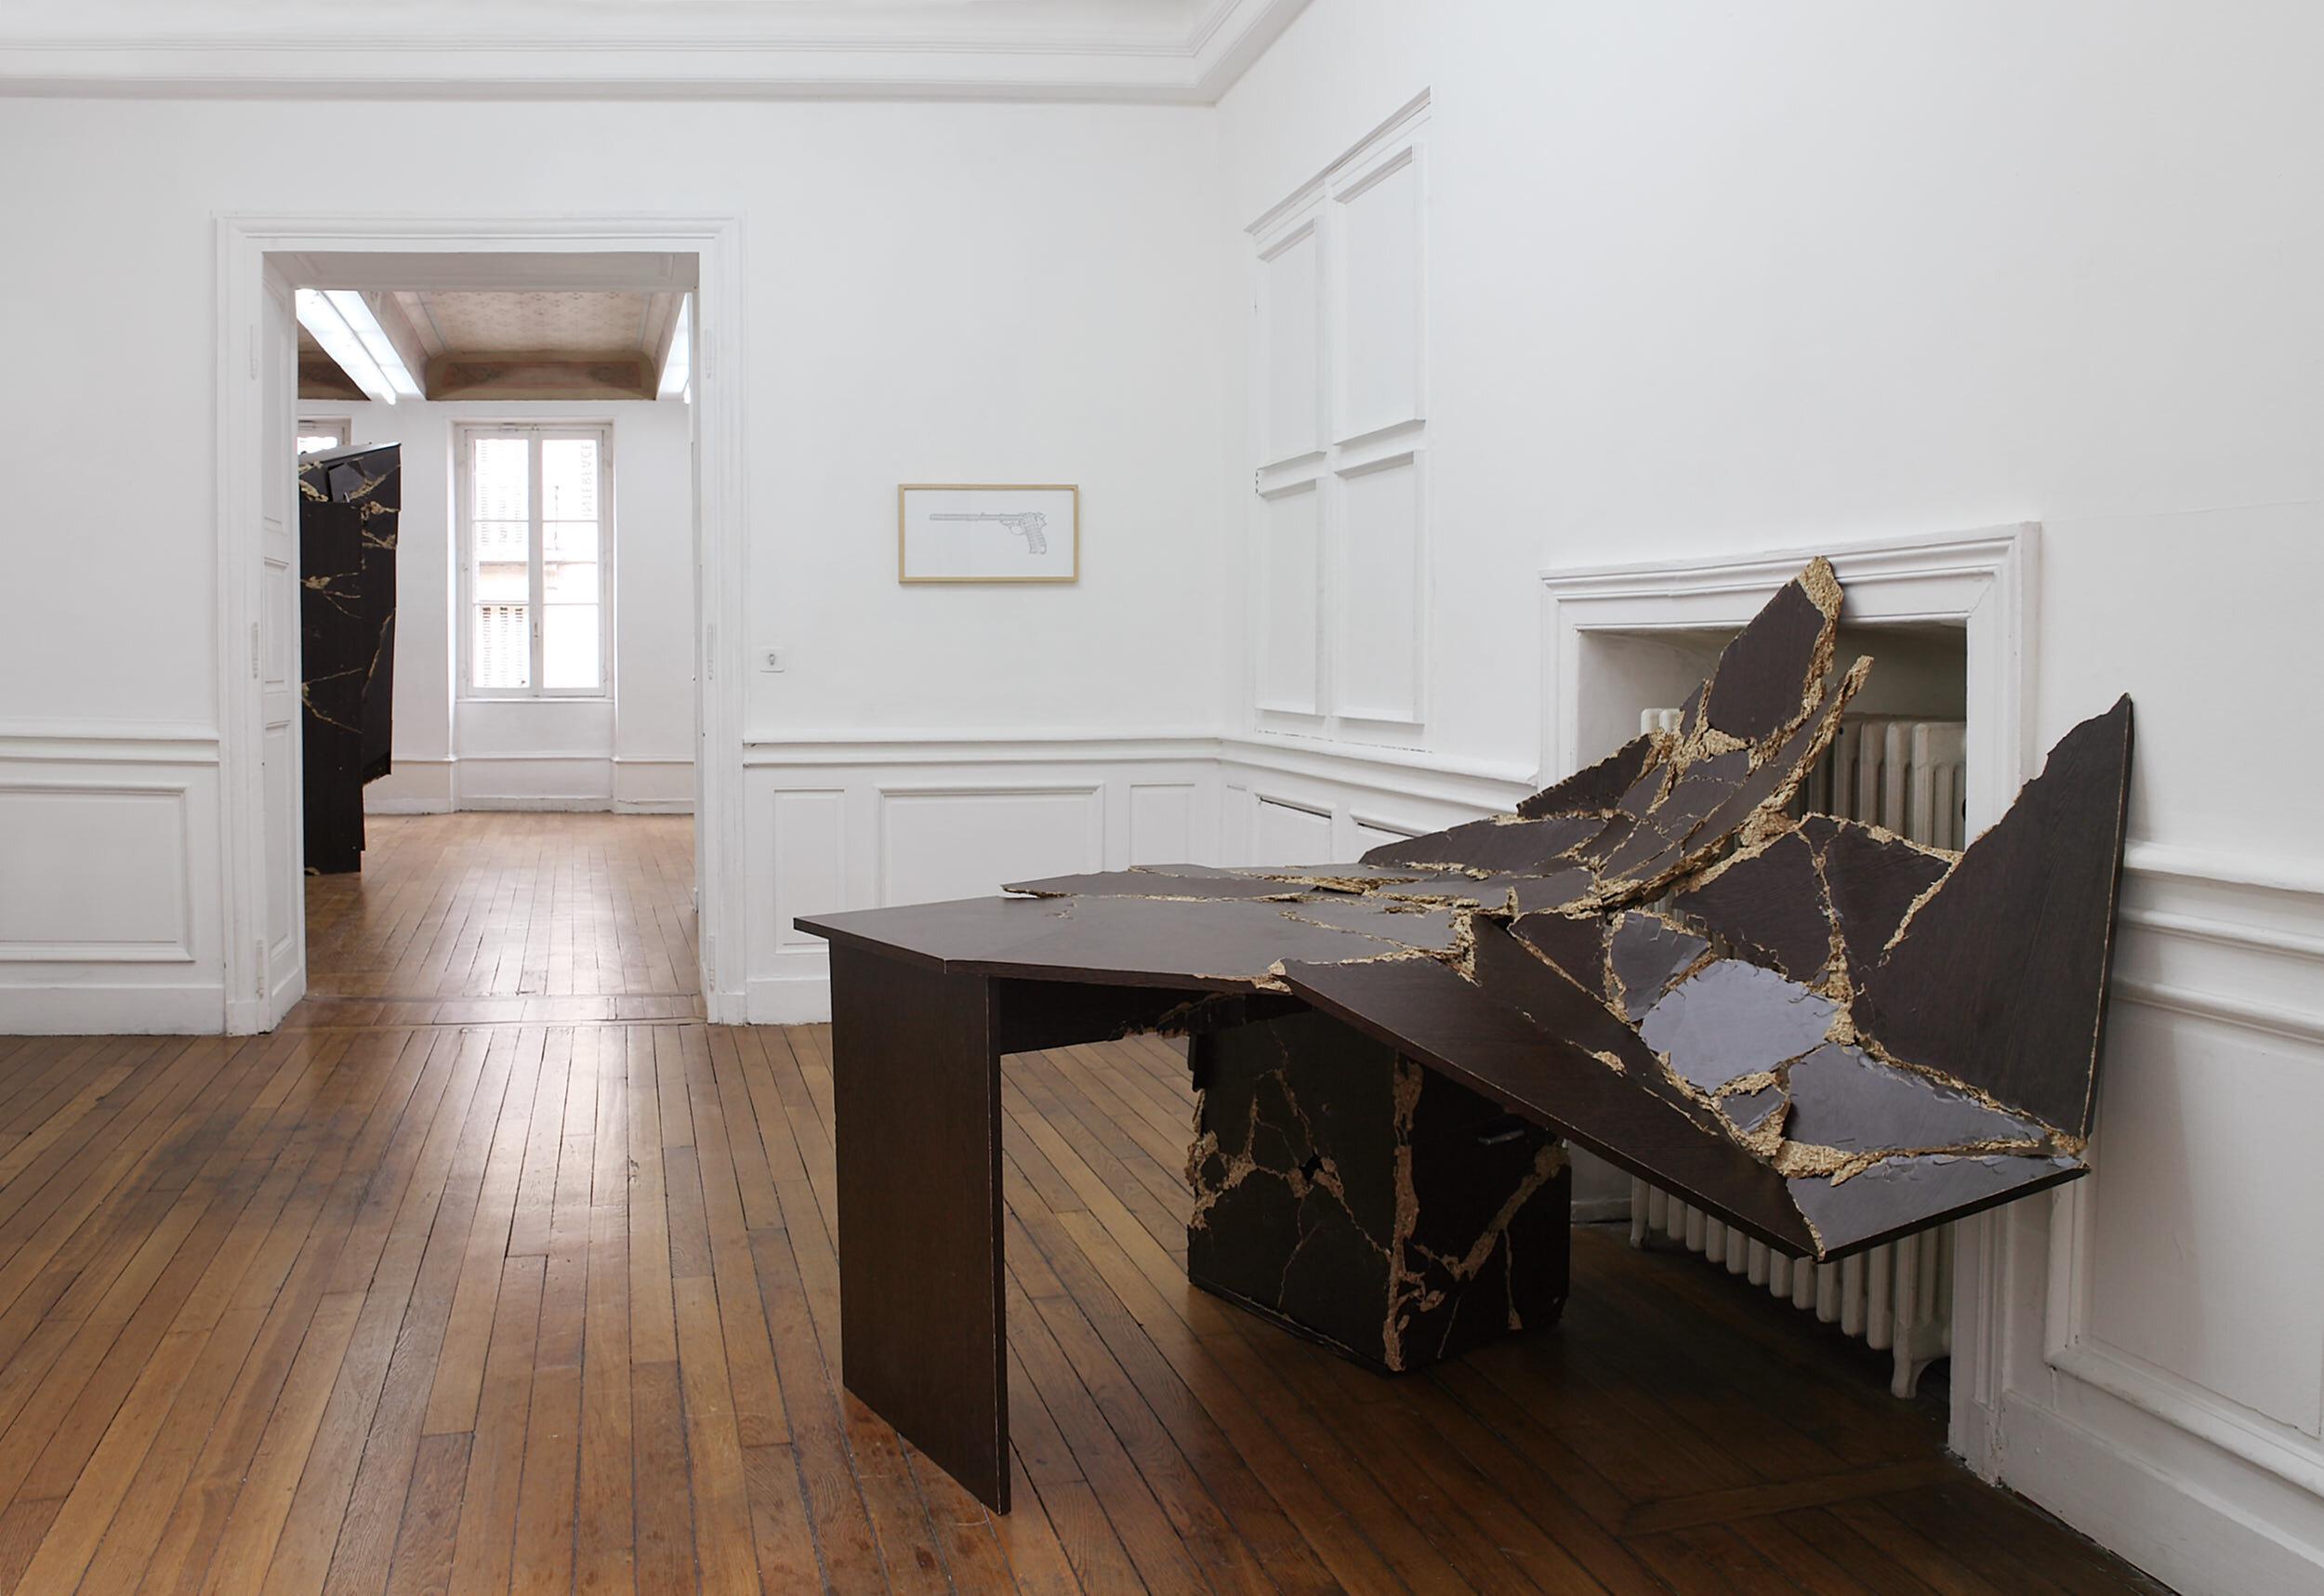 Inception — Courtesy Patricia Dorfmann Gallery, Paris